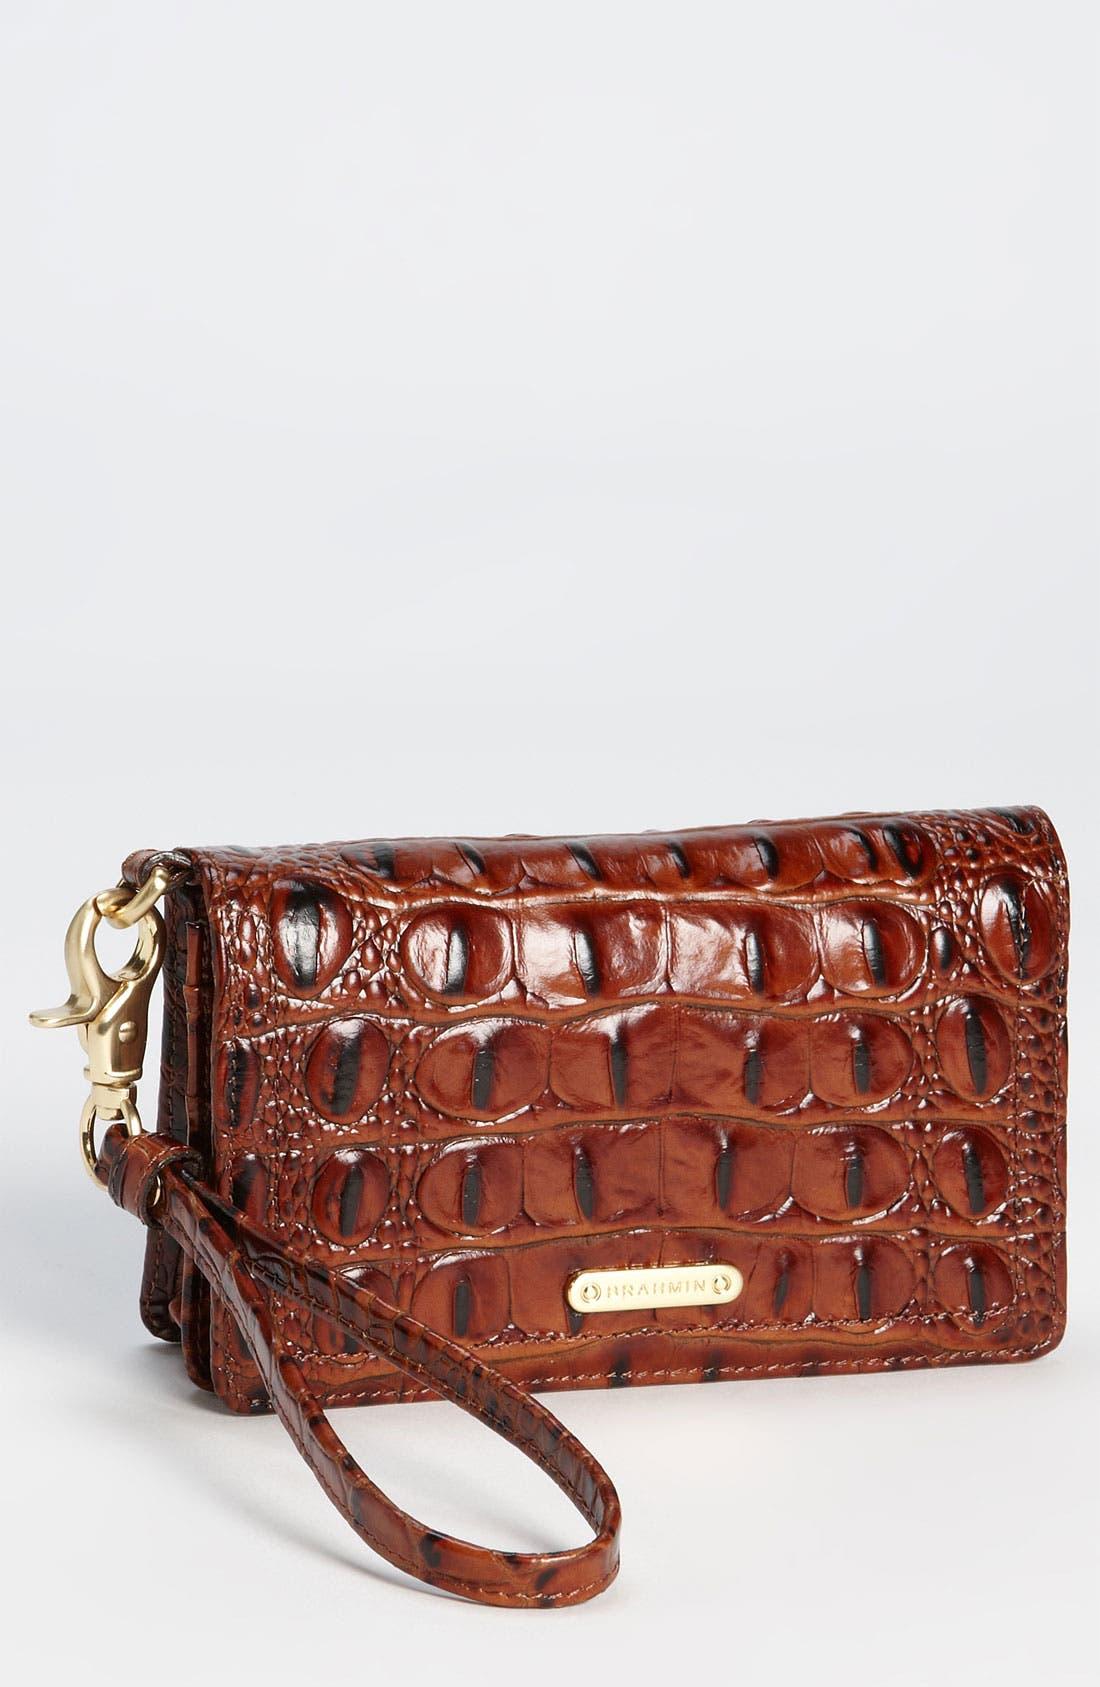 Alternate Image 1 Selected - Brahmin 'Debi' Croc Embossed Leather Wristlet